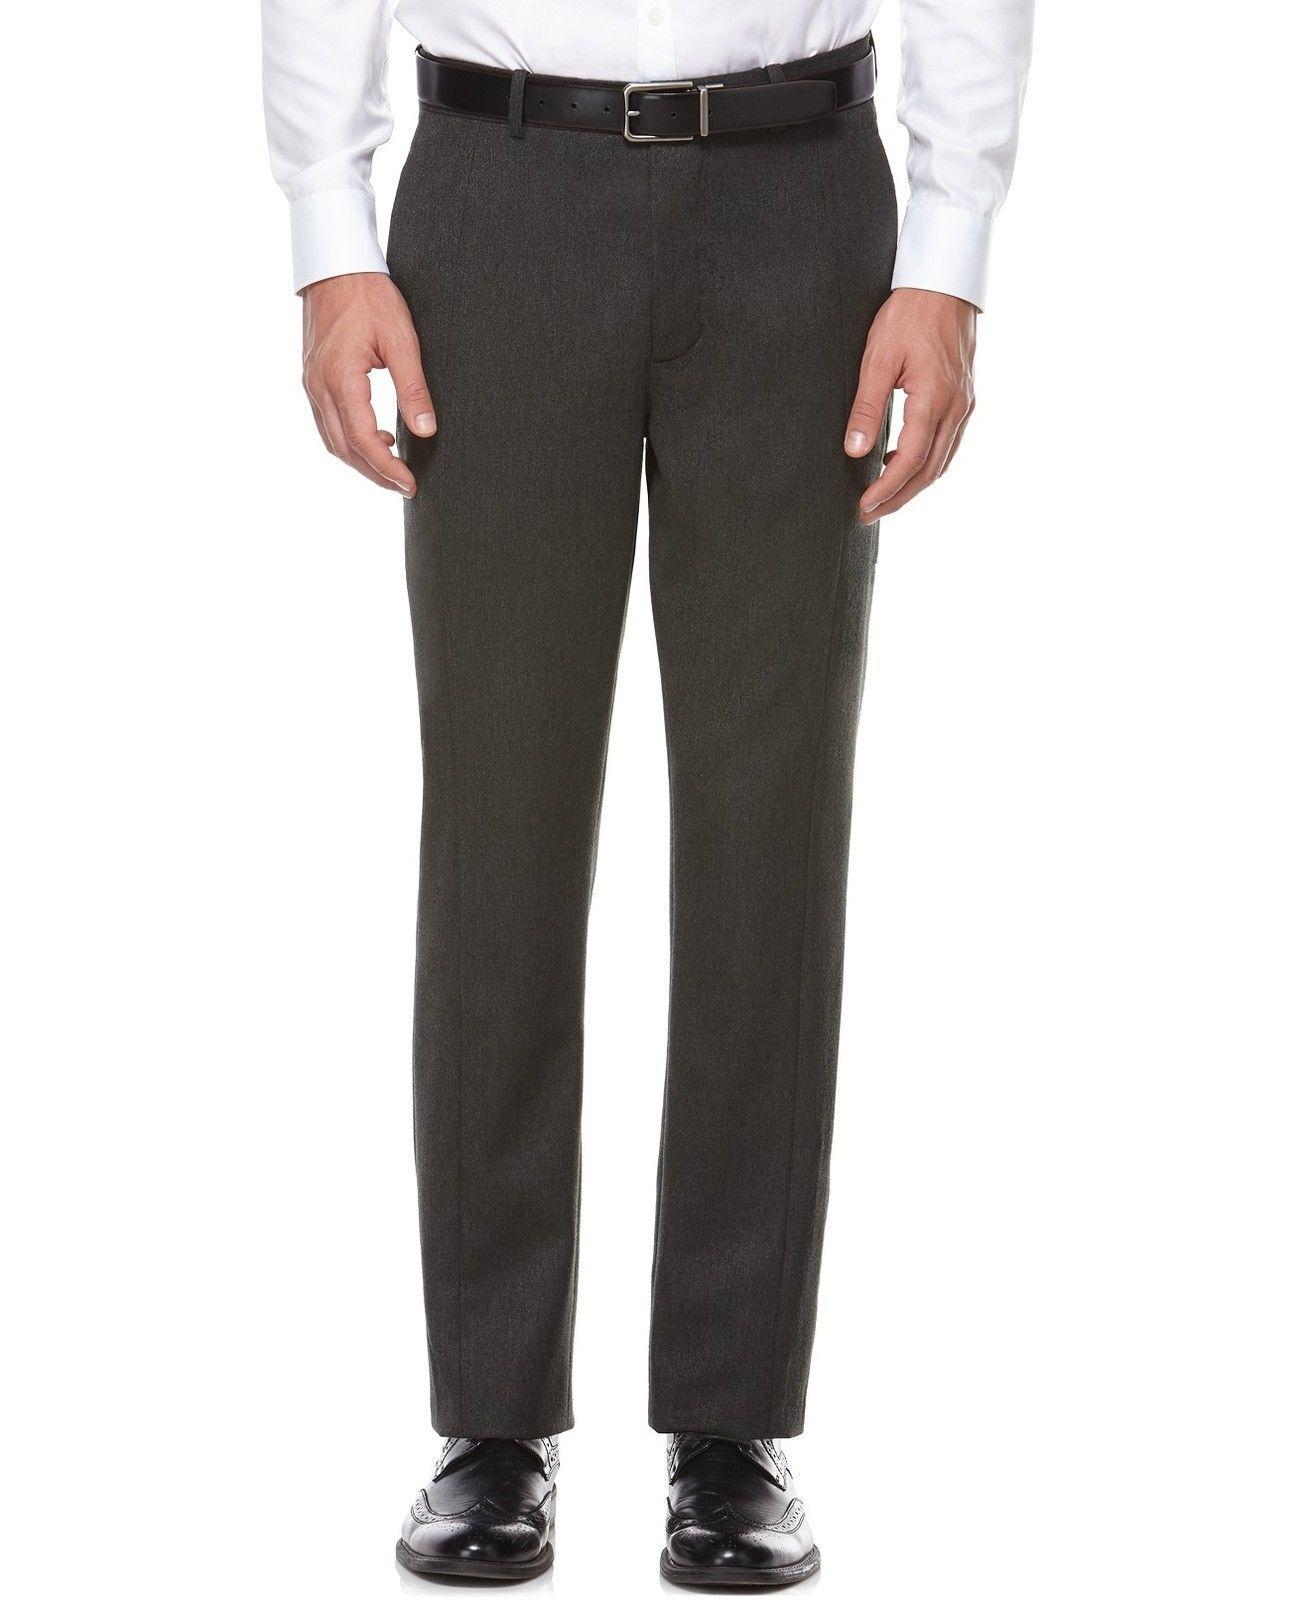 New Mens Perry Ellis Wool Cargo Tweed Pants Deep Liche Flat Front 32 x 30